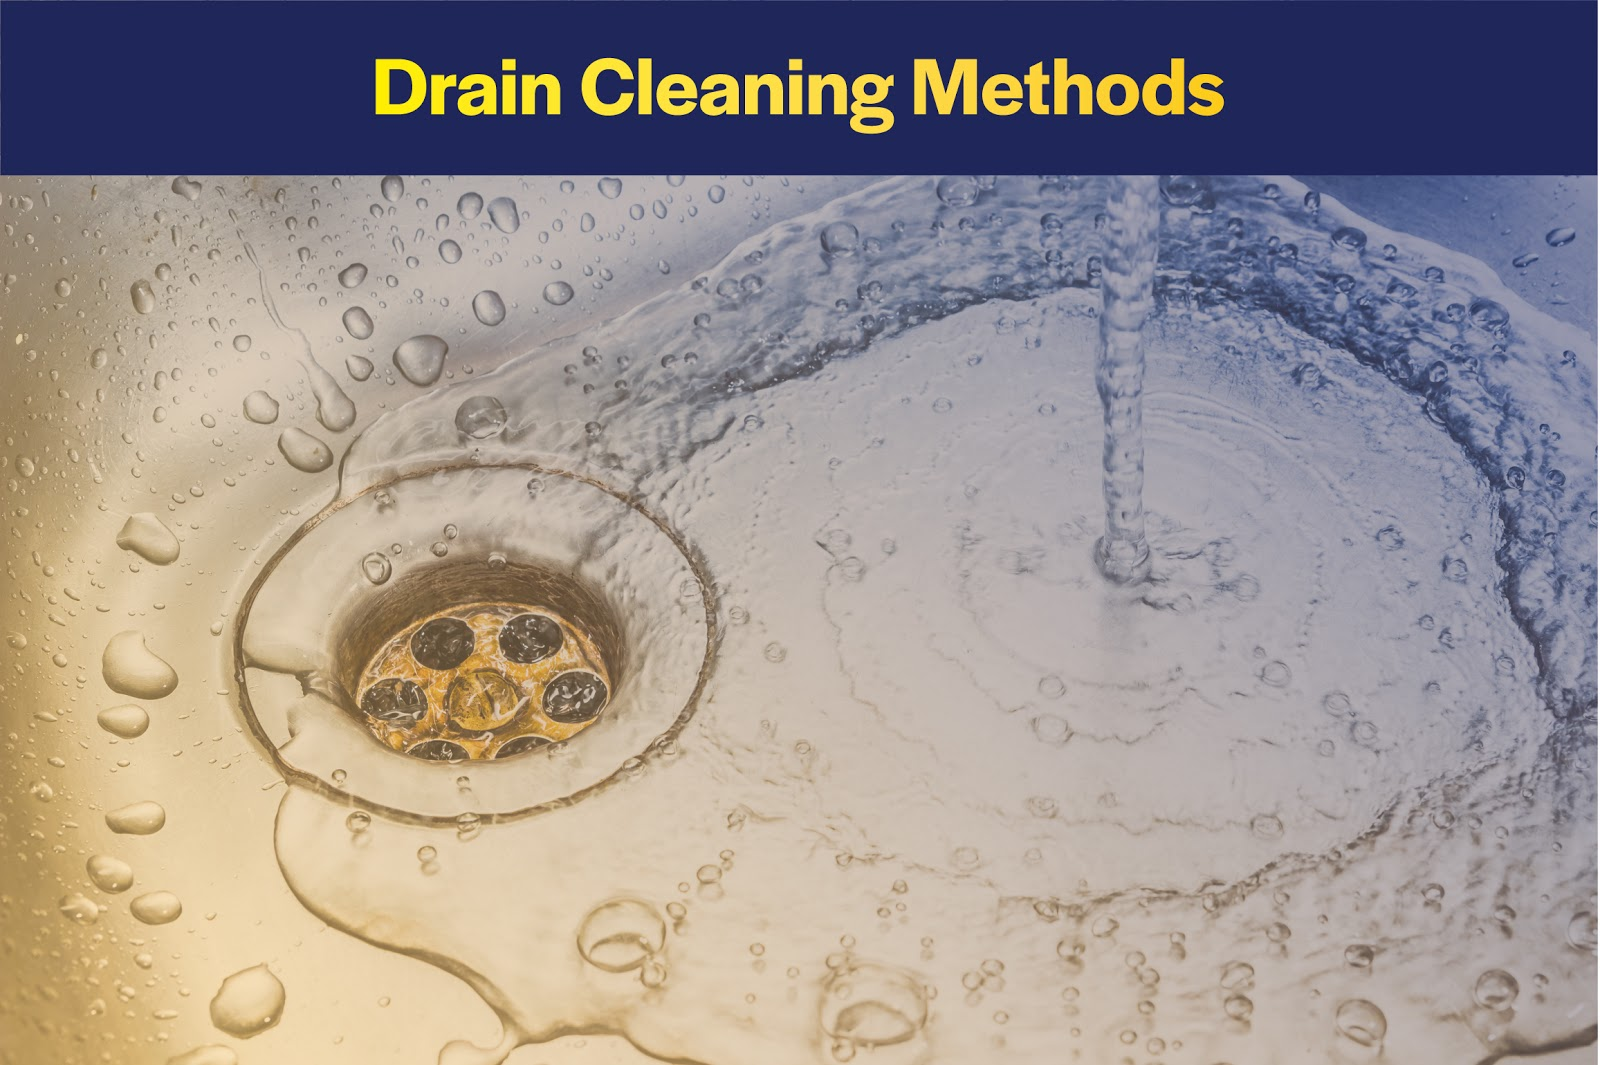 drain cleaning methods